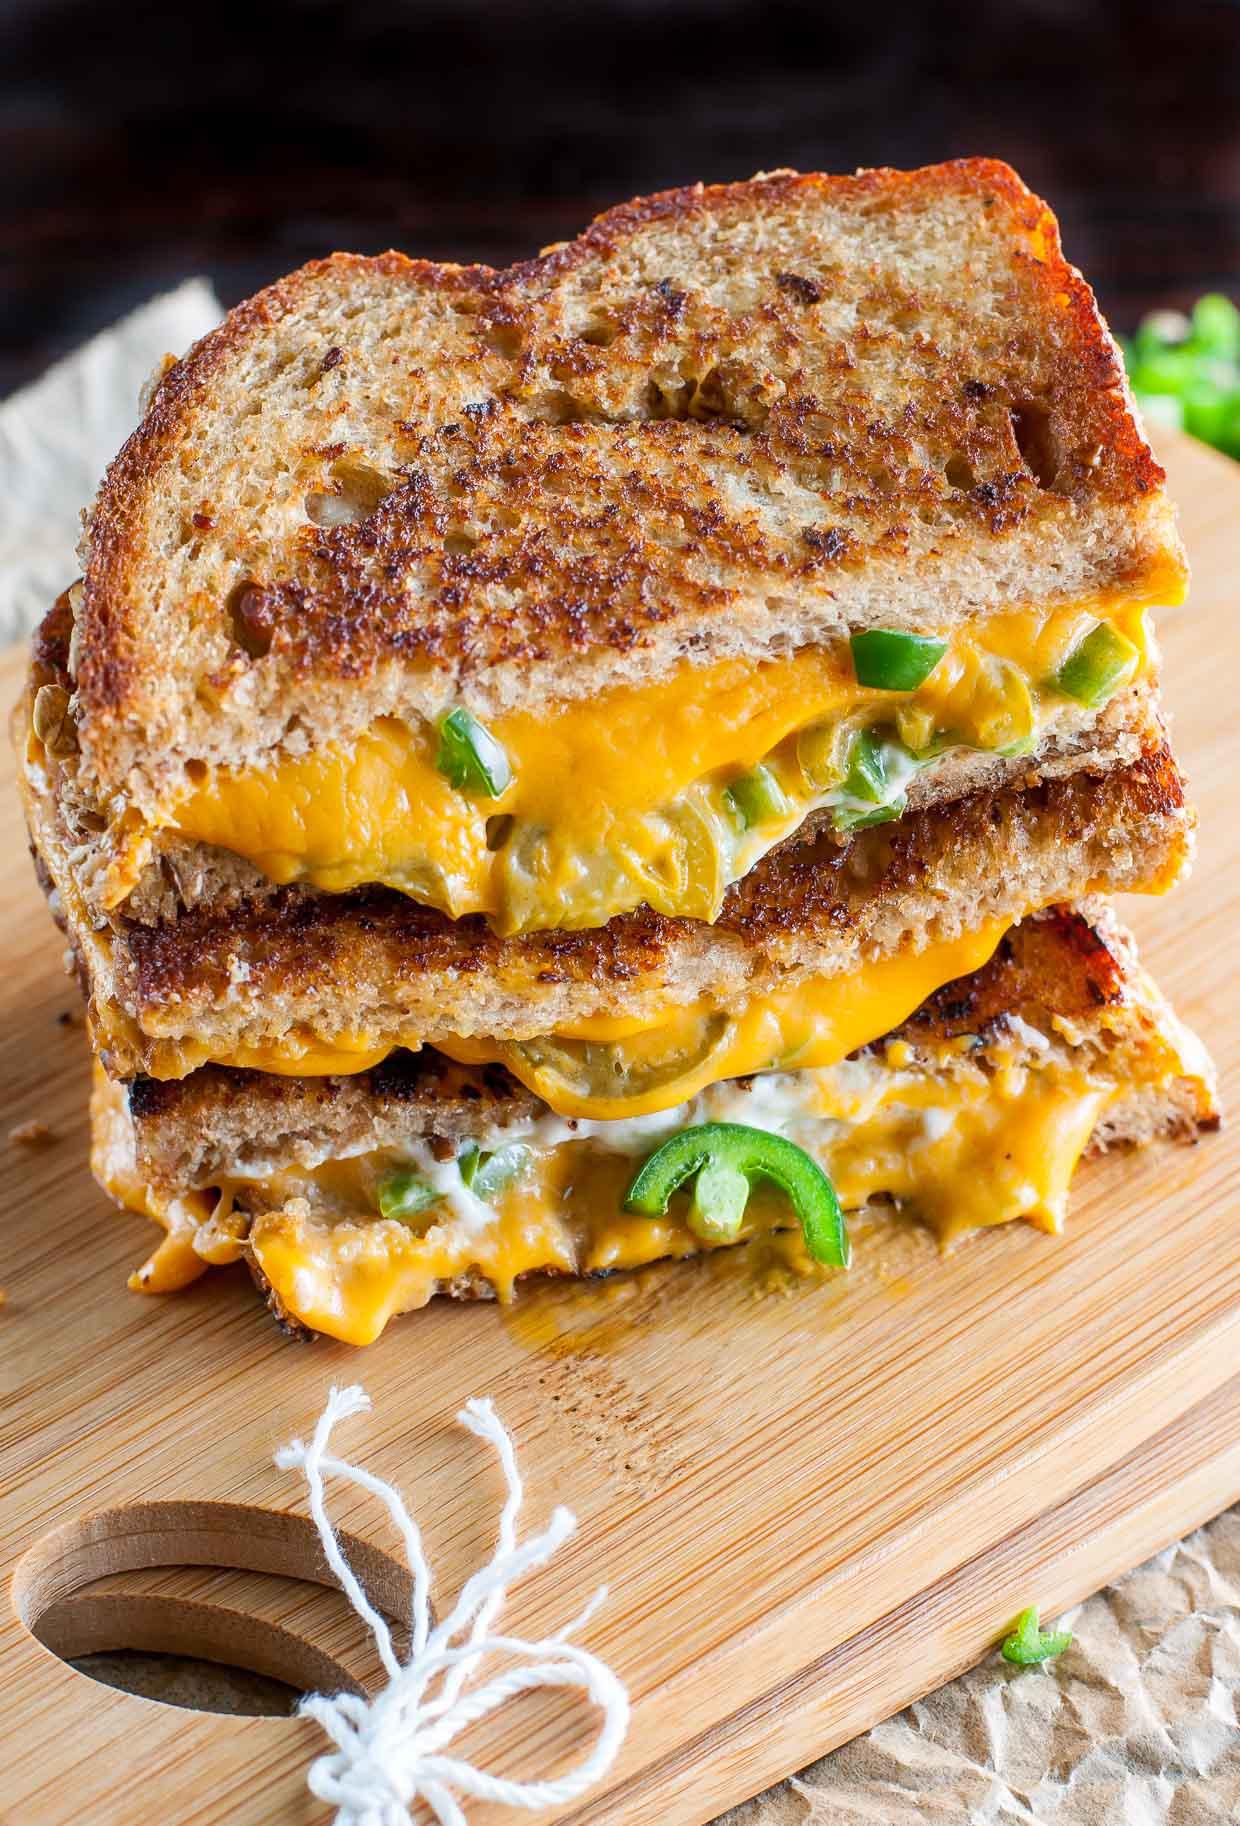 easy-cheesy-jalapeno-popper-vegan-grilled-cheese-recipe-773.jpg